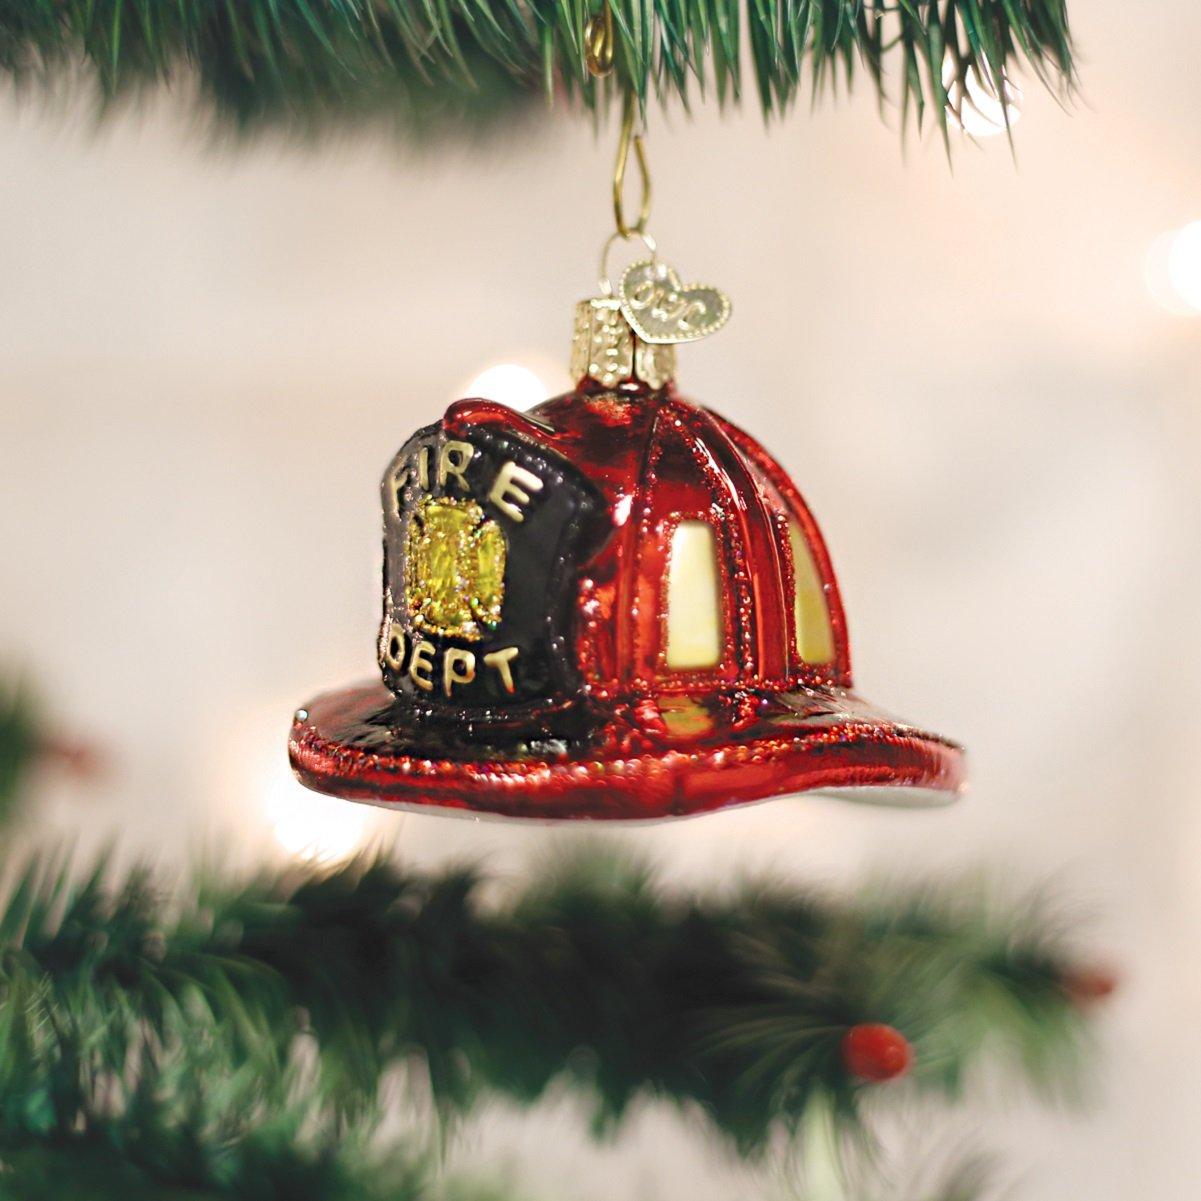 Old World Christmas Ornaments: Fireman's Helmet Glass Blown Ornaments for Christmas Tree